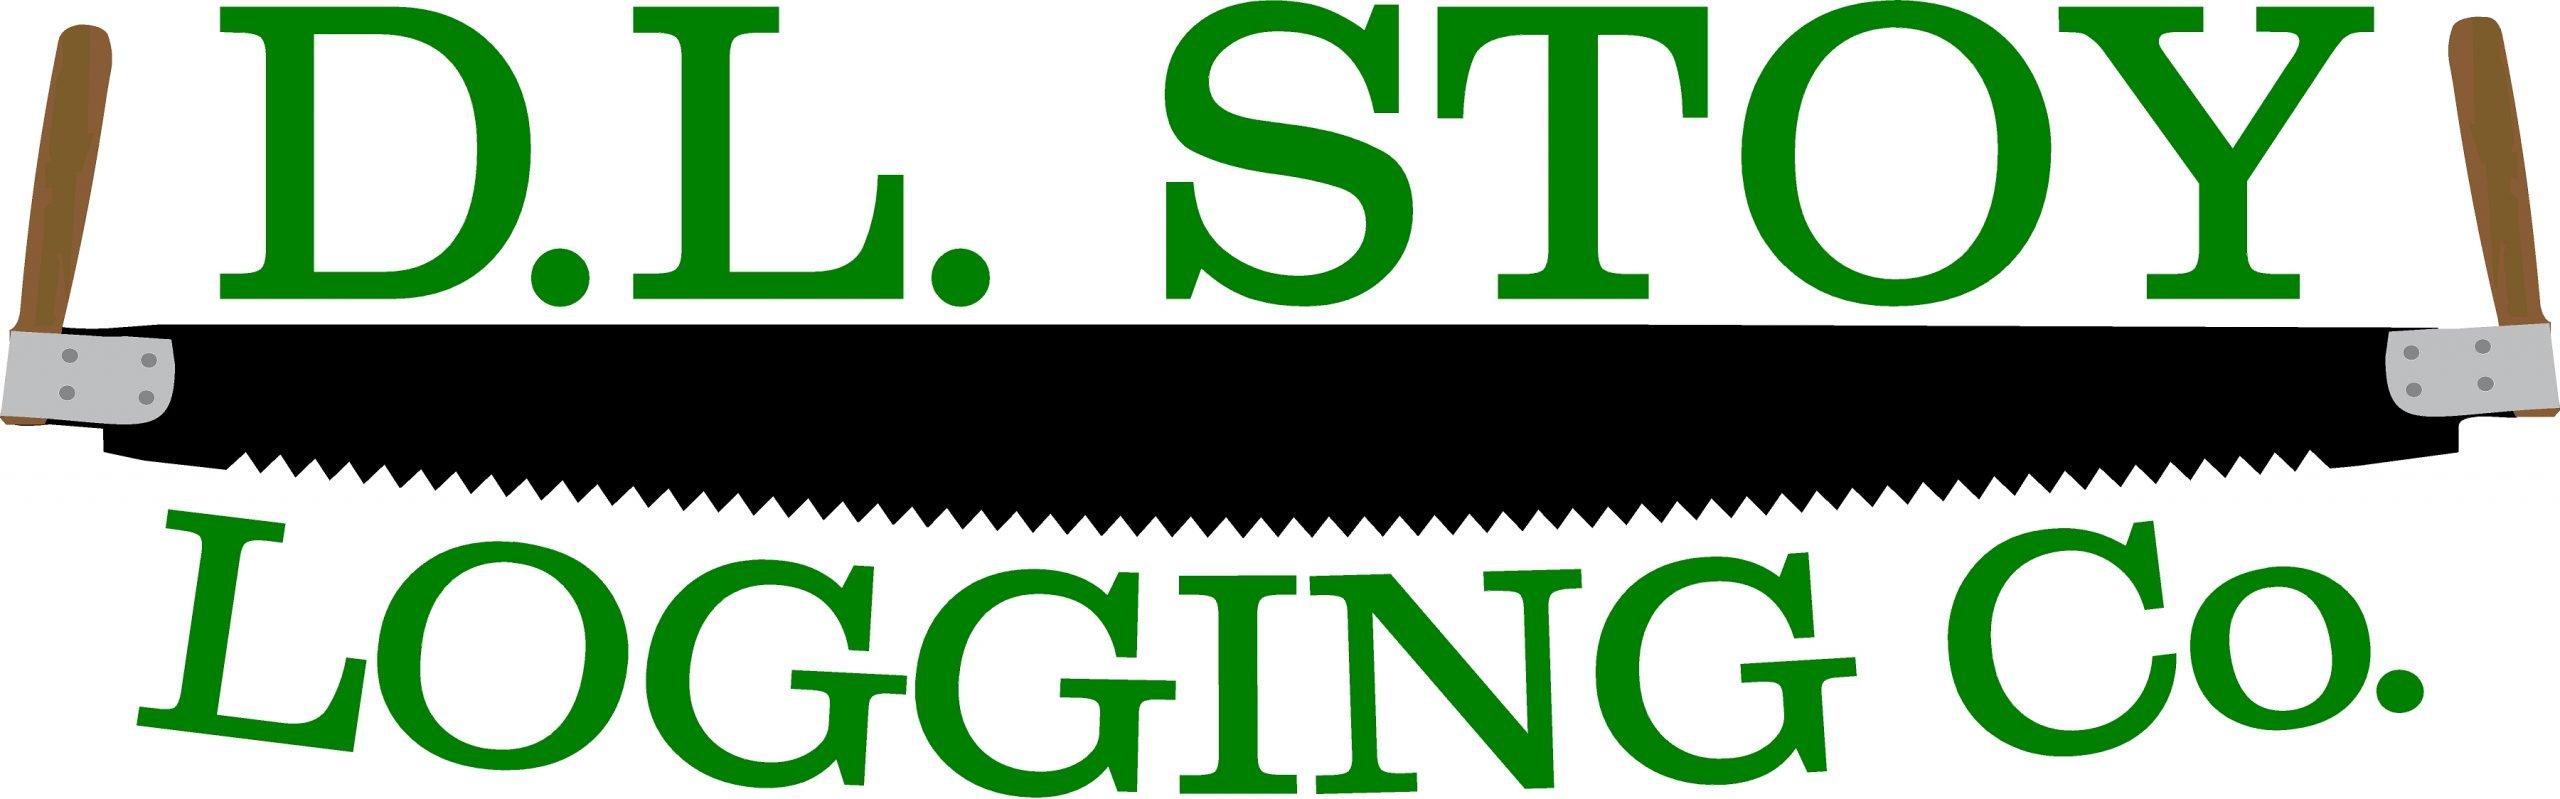 DL Stoy Logging Co.